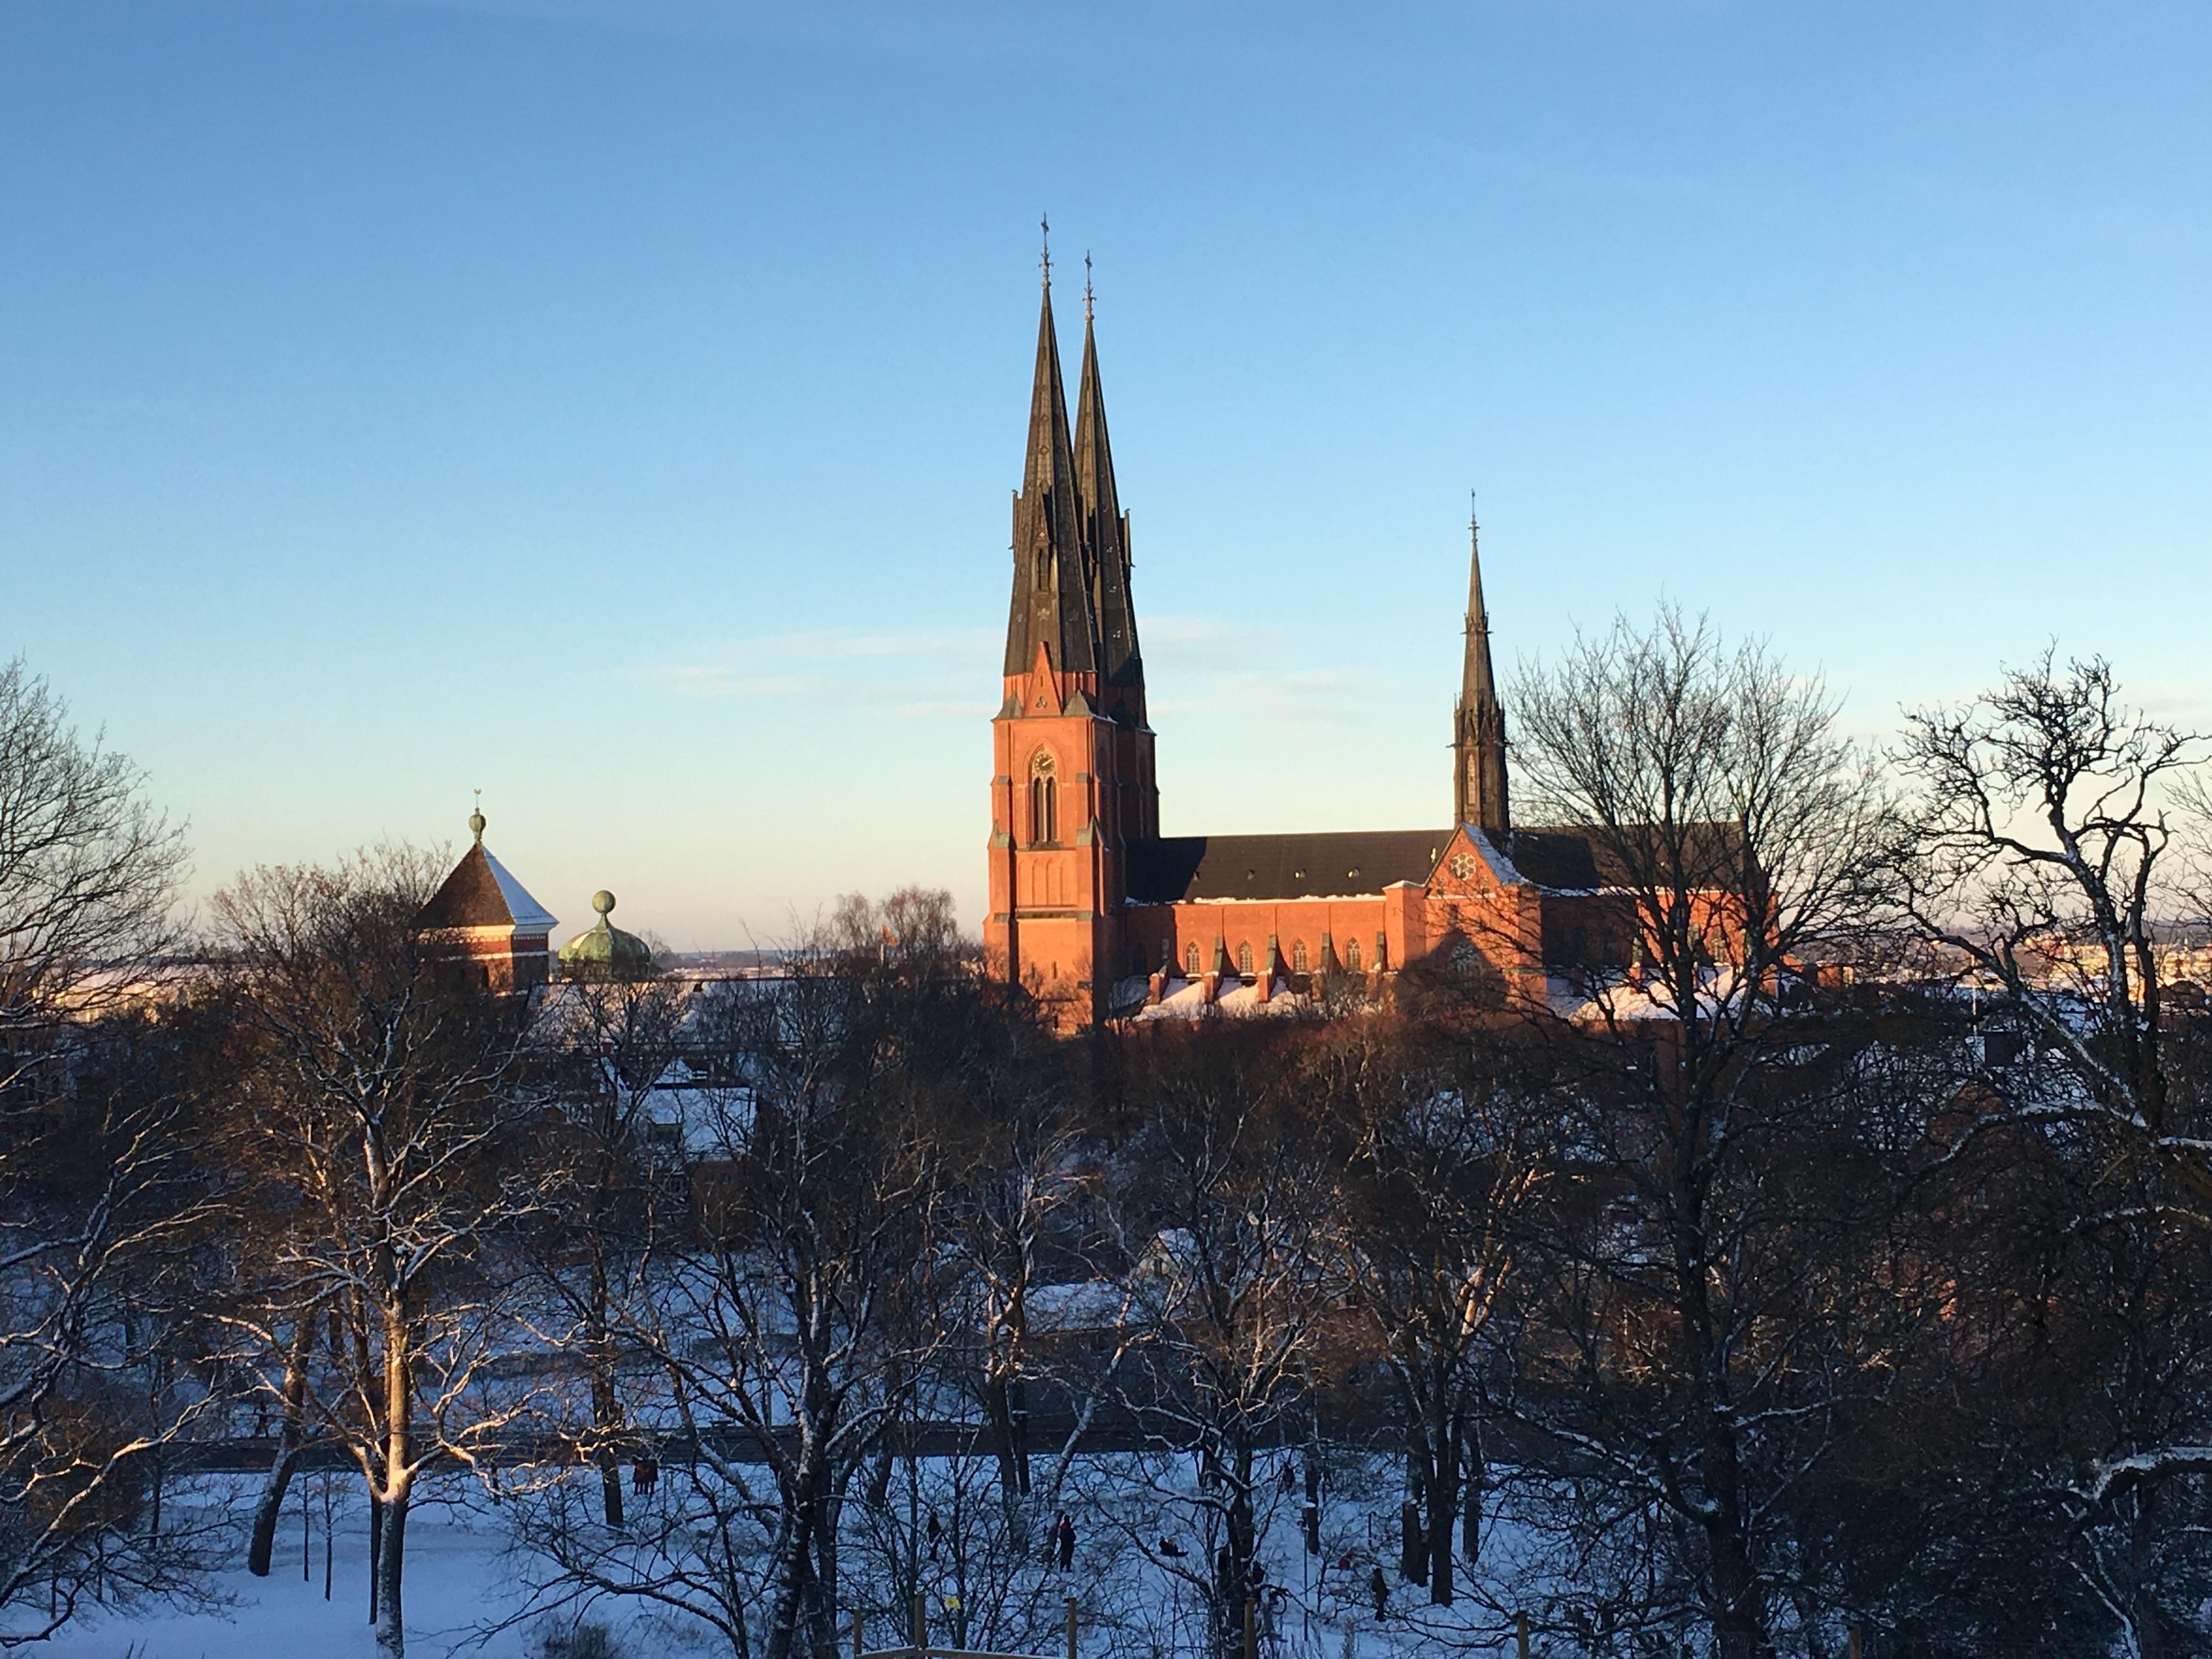 vstra eneby kyrka - stergtlands museum